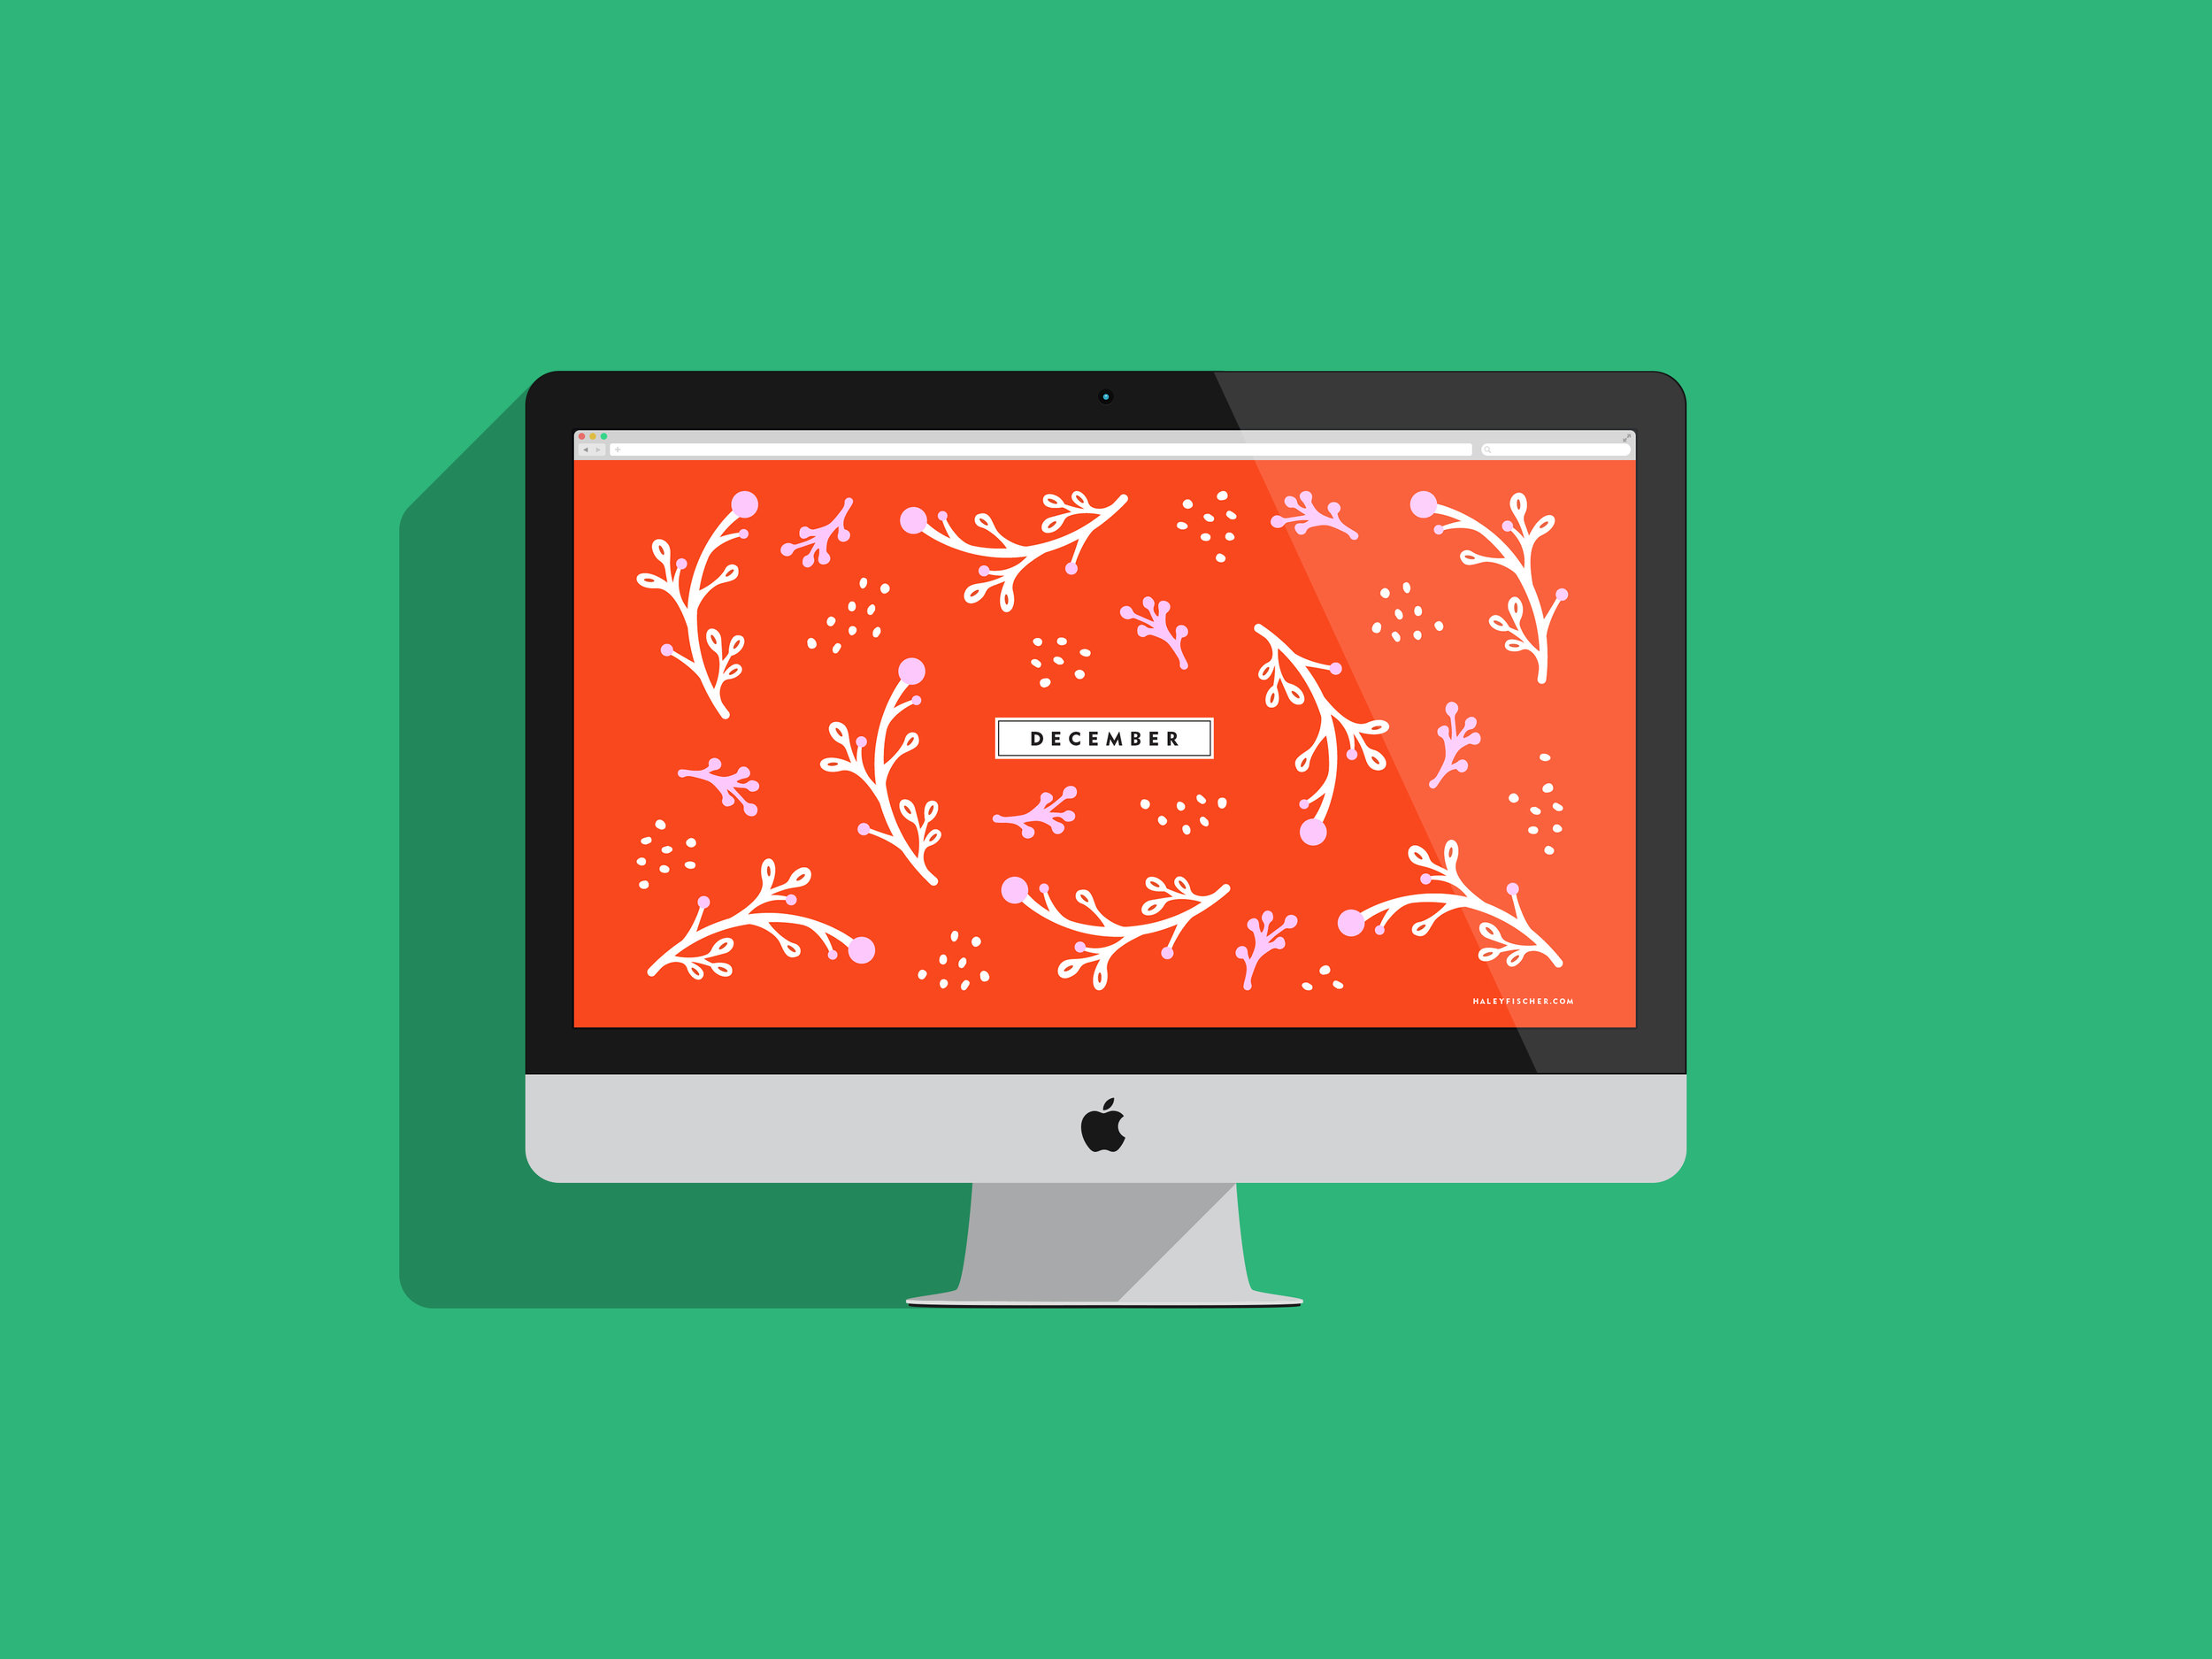 Dec_Wallpaper.jpg